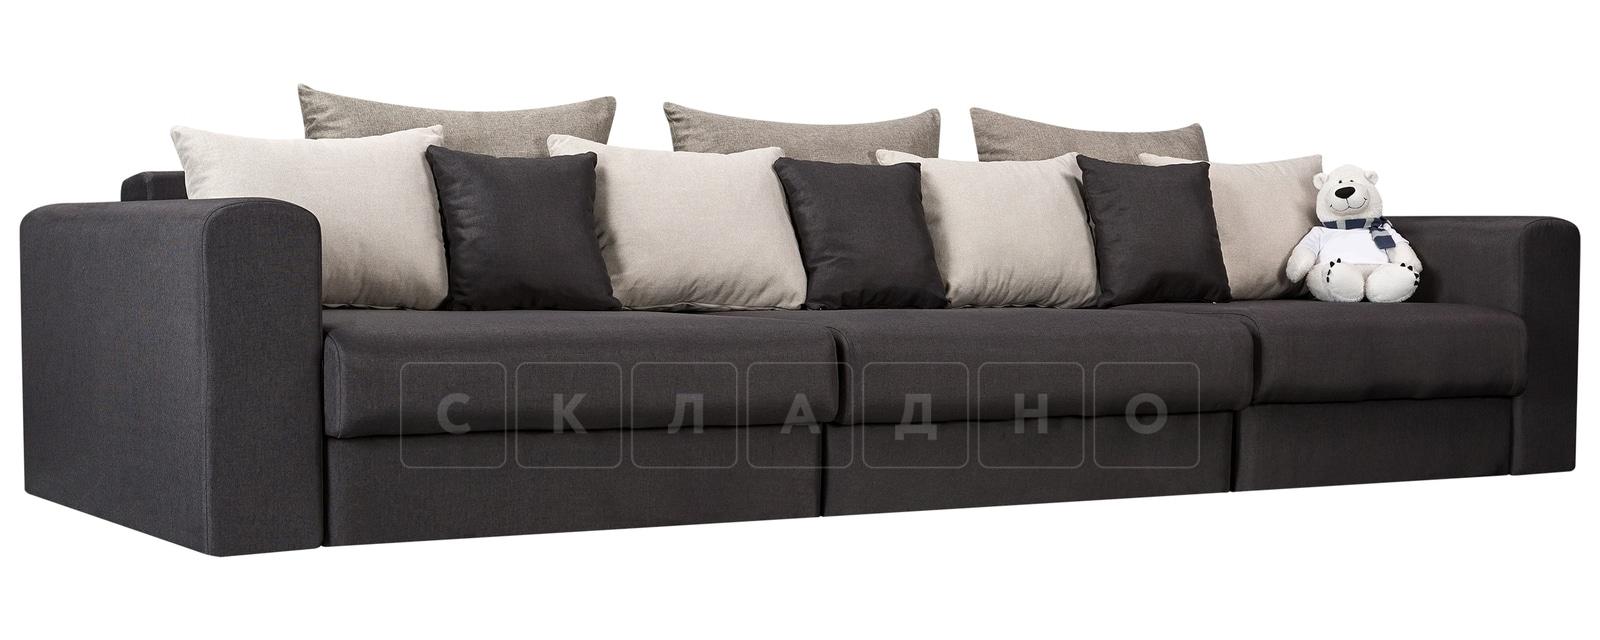 Диван Медисон темно-серый 325 см фото 1 | интернет-магазин Складно